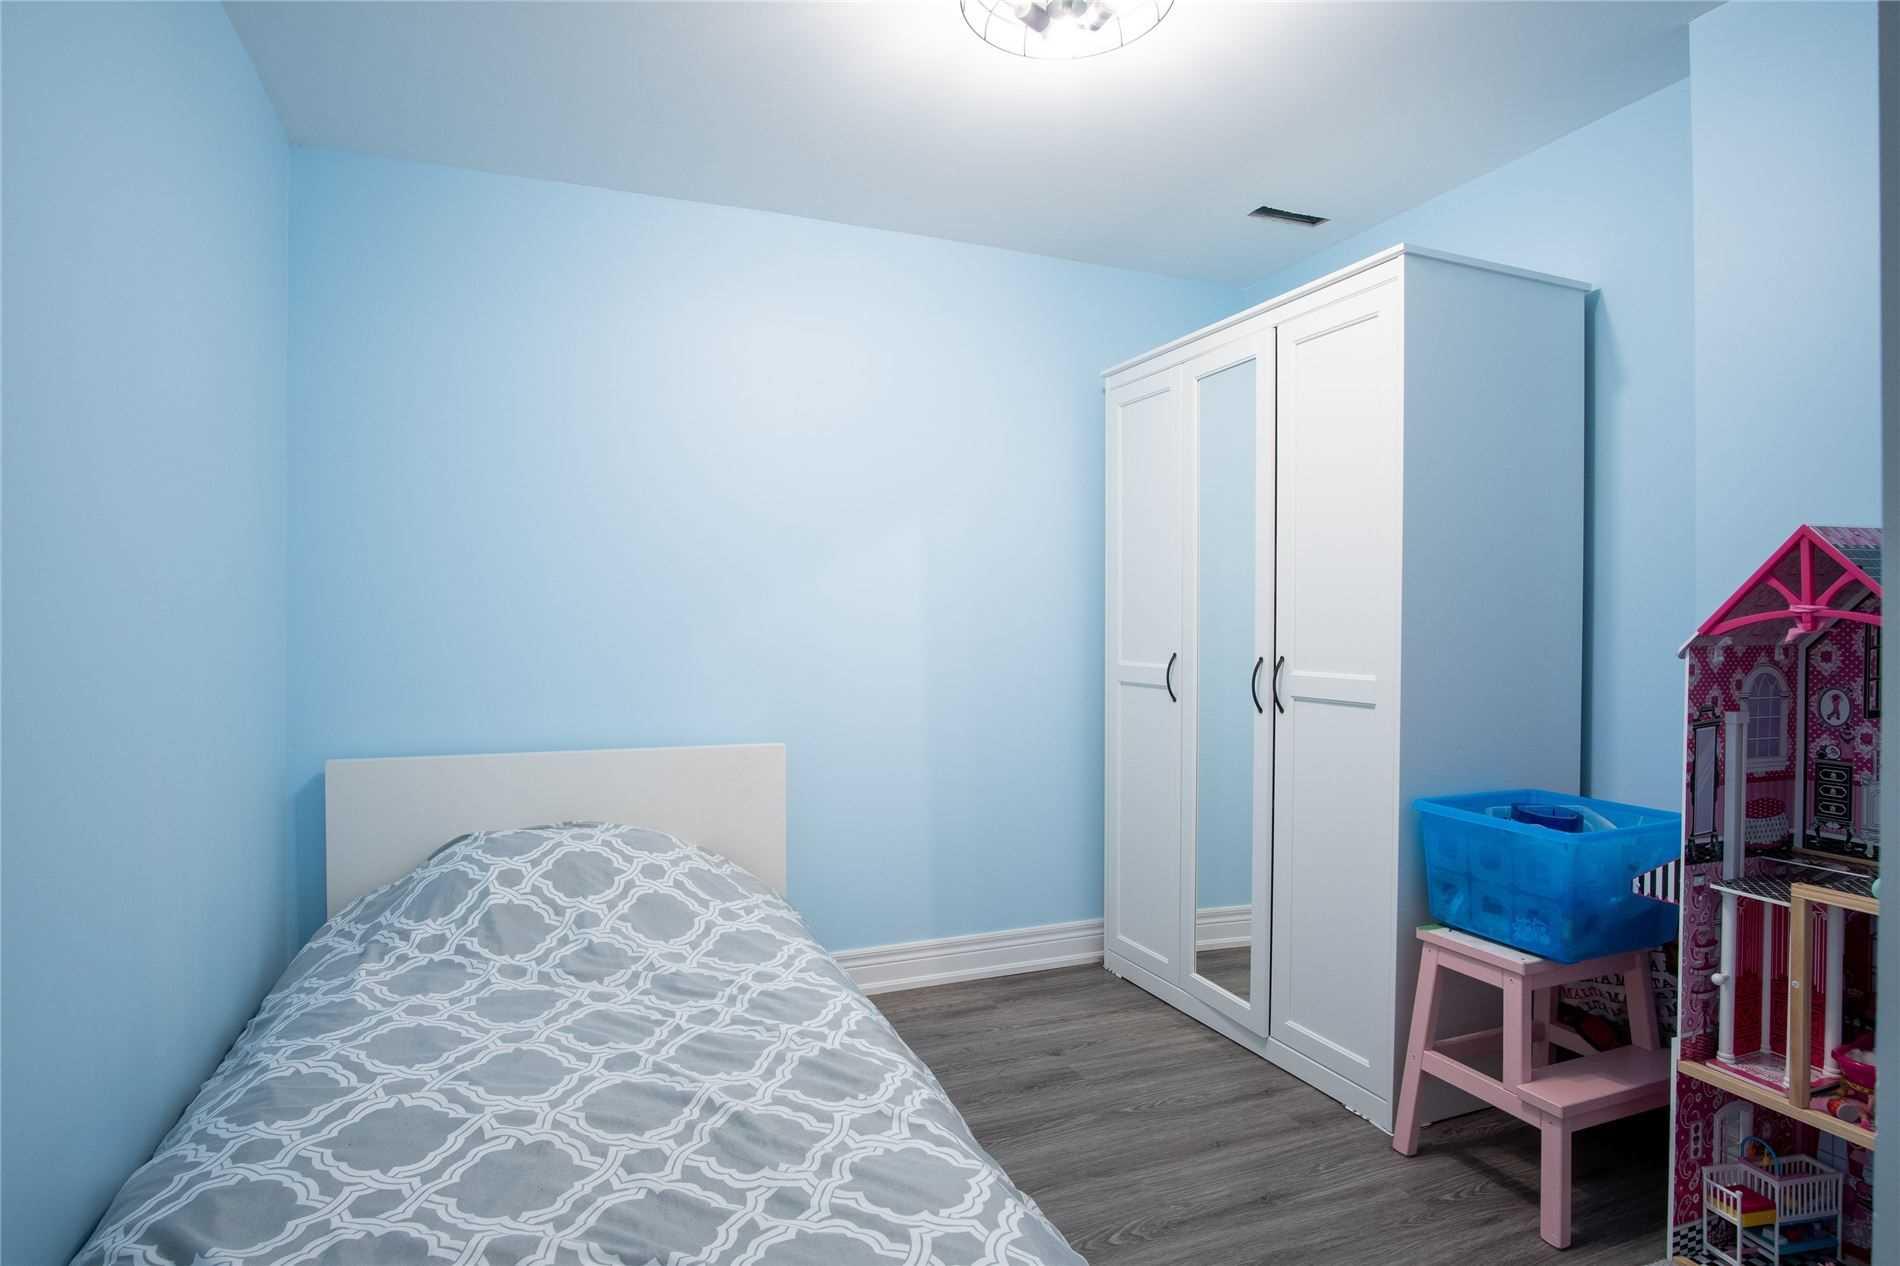 827 Biggar Hts - Coates Detached for sale, 4 Bedrooms (W5400280) - #23